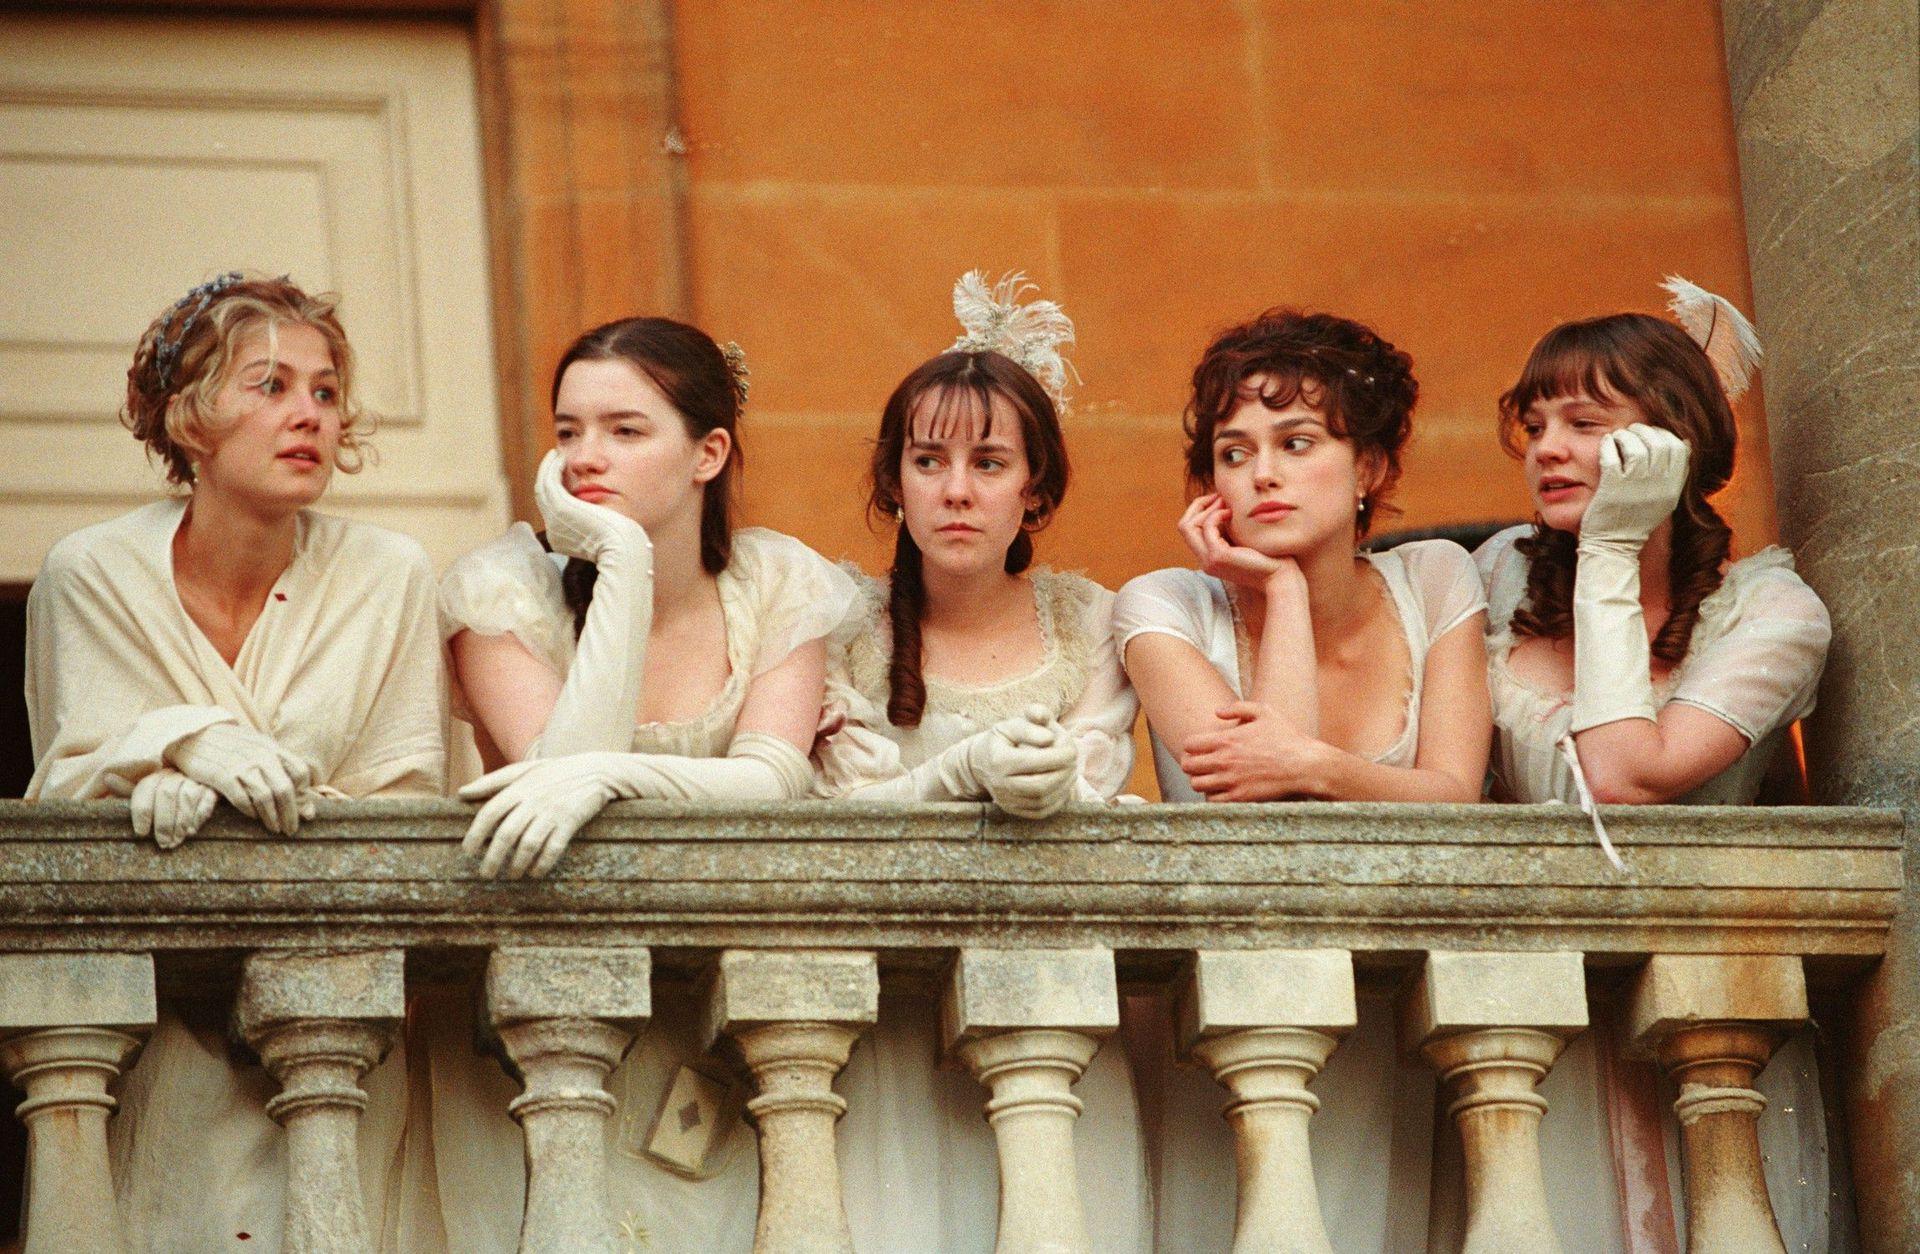 Las hermanas Bennet: Rosamund Pike, Talulah Riley, Jena Malone, Keira Knightley, y Carey Mulligan